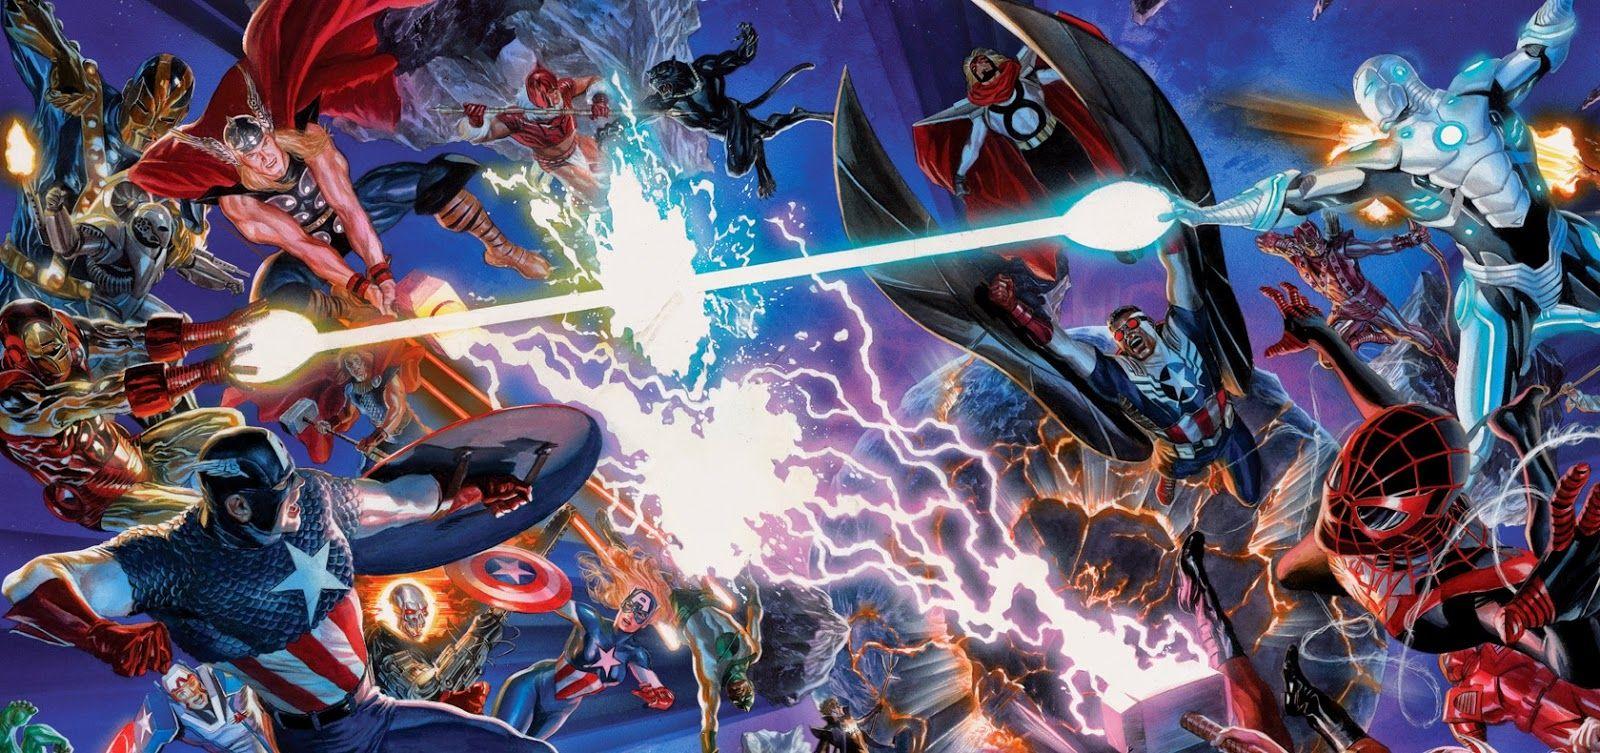 Best Wallpaper Marvel Secret Wars - 1f61408f1d0f2f3a585fe7c2a4fb2461  Perfect Image Reference_597236.jpg